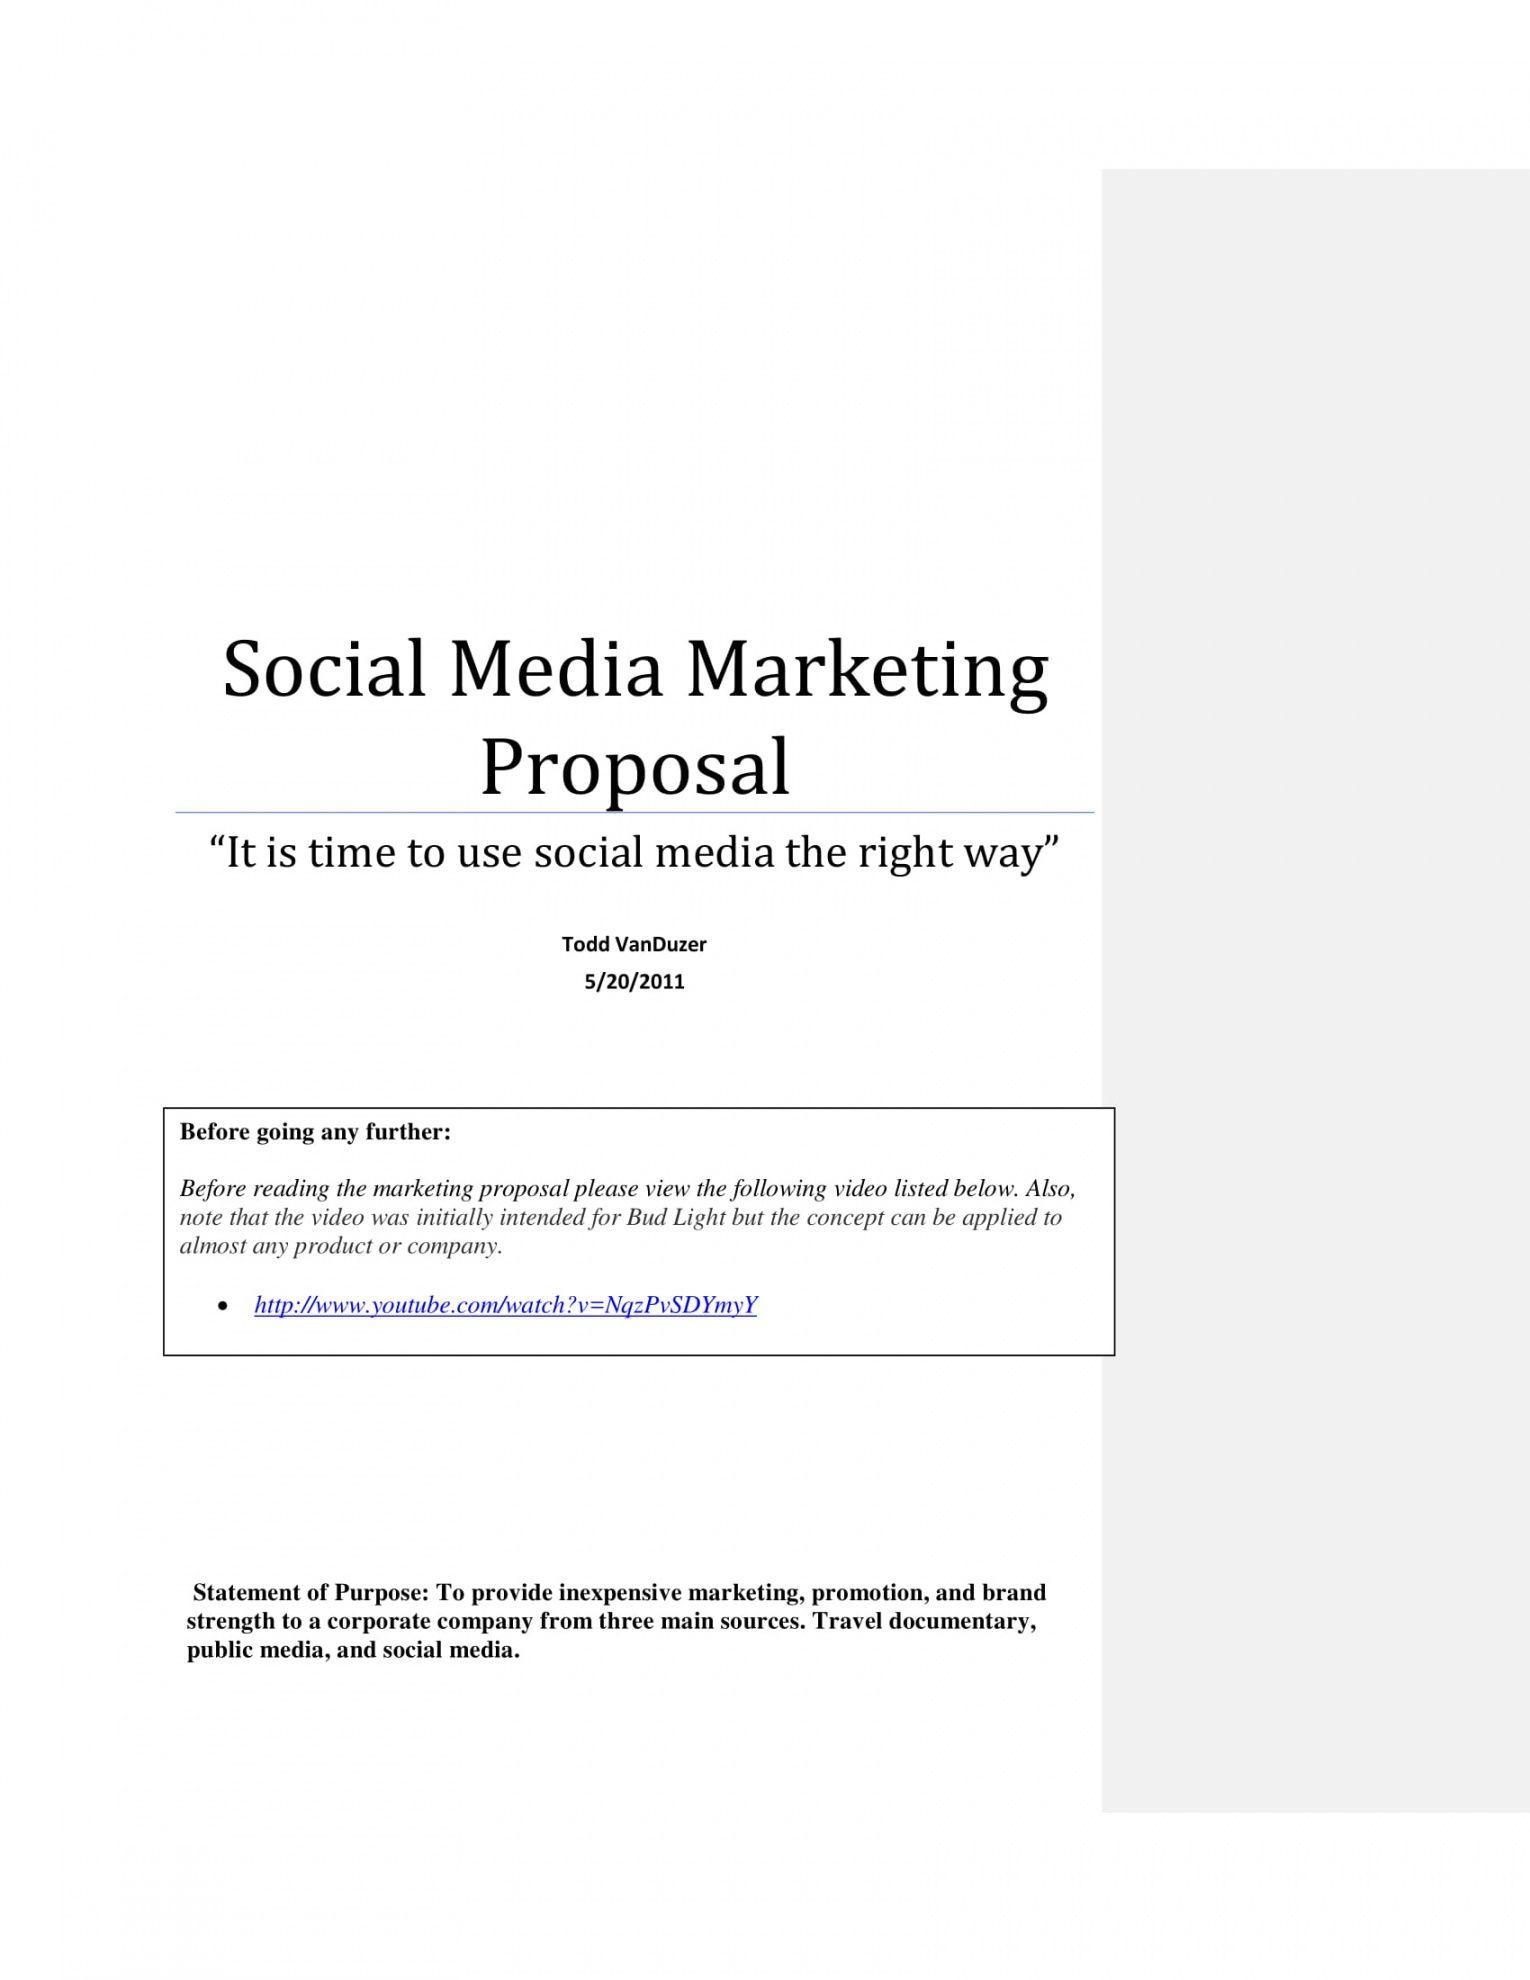 Cross Promotion Proposal Template Proposal Templates Marketing Proposal Marketing Proposal Template